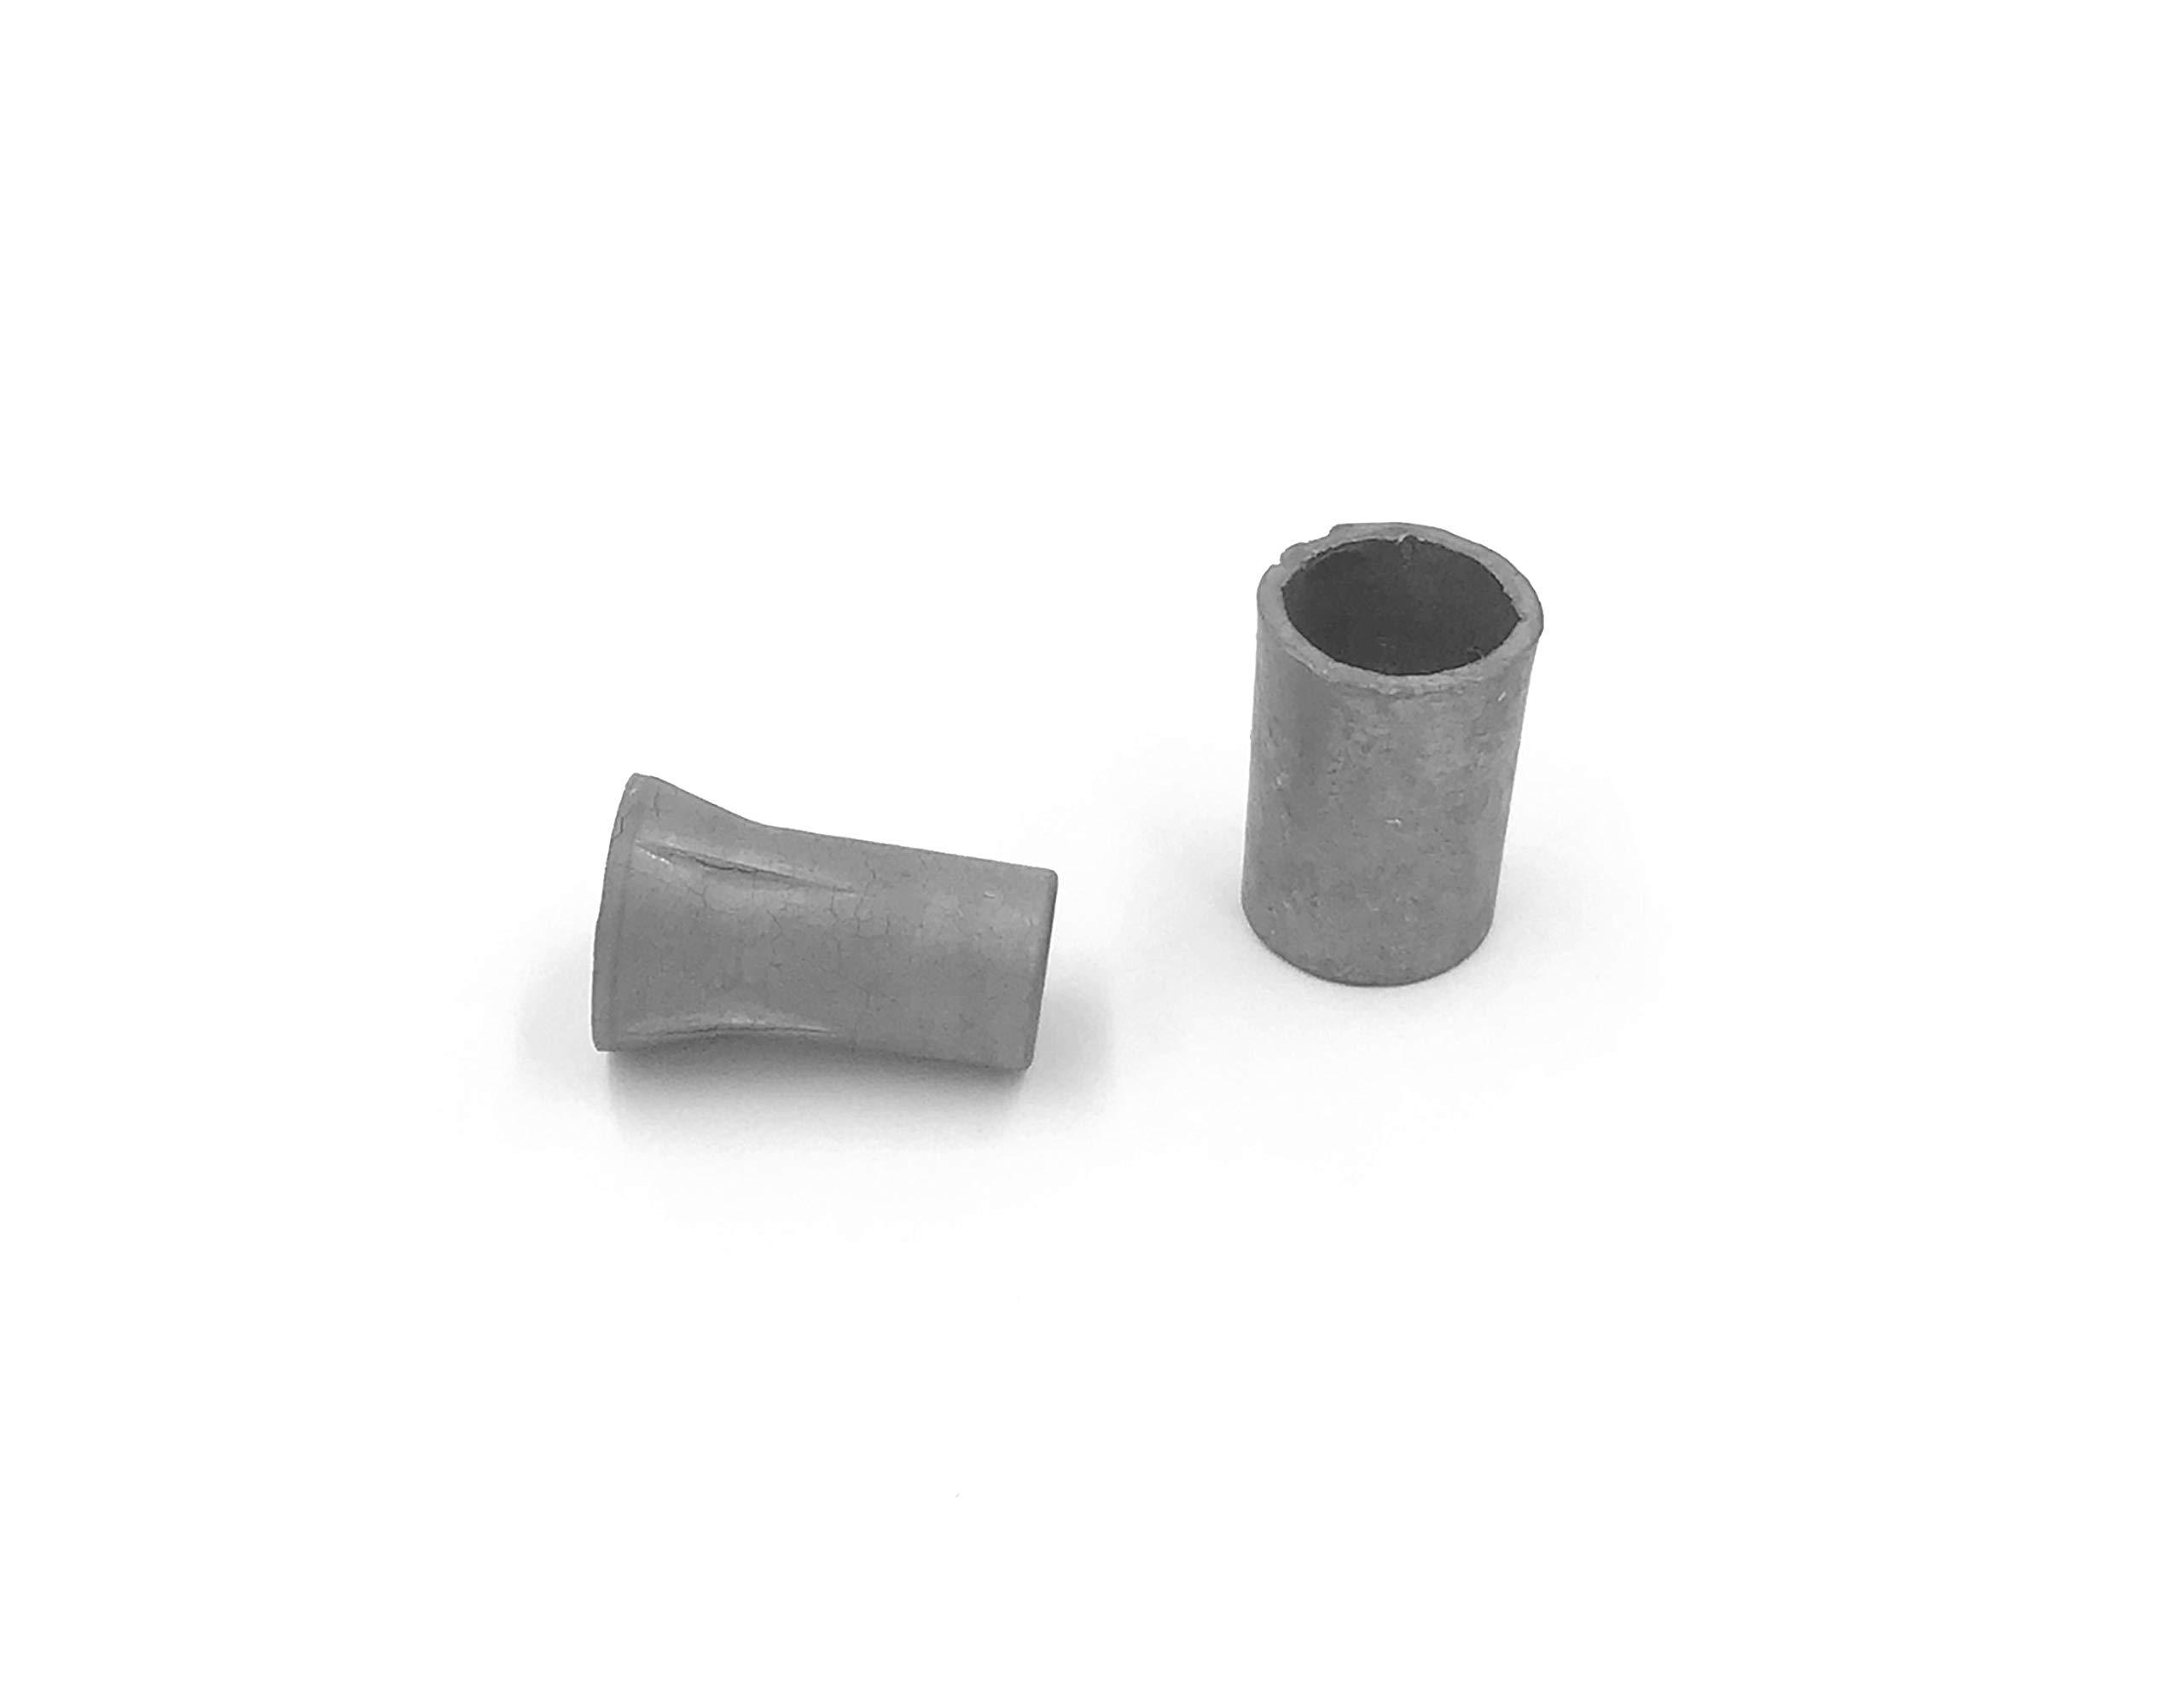 1/2''-13 Lead Machine Screw Anchors(25 Pack)